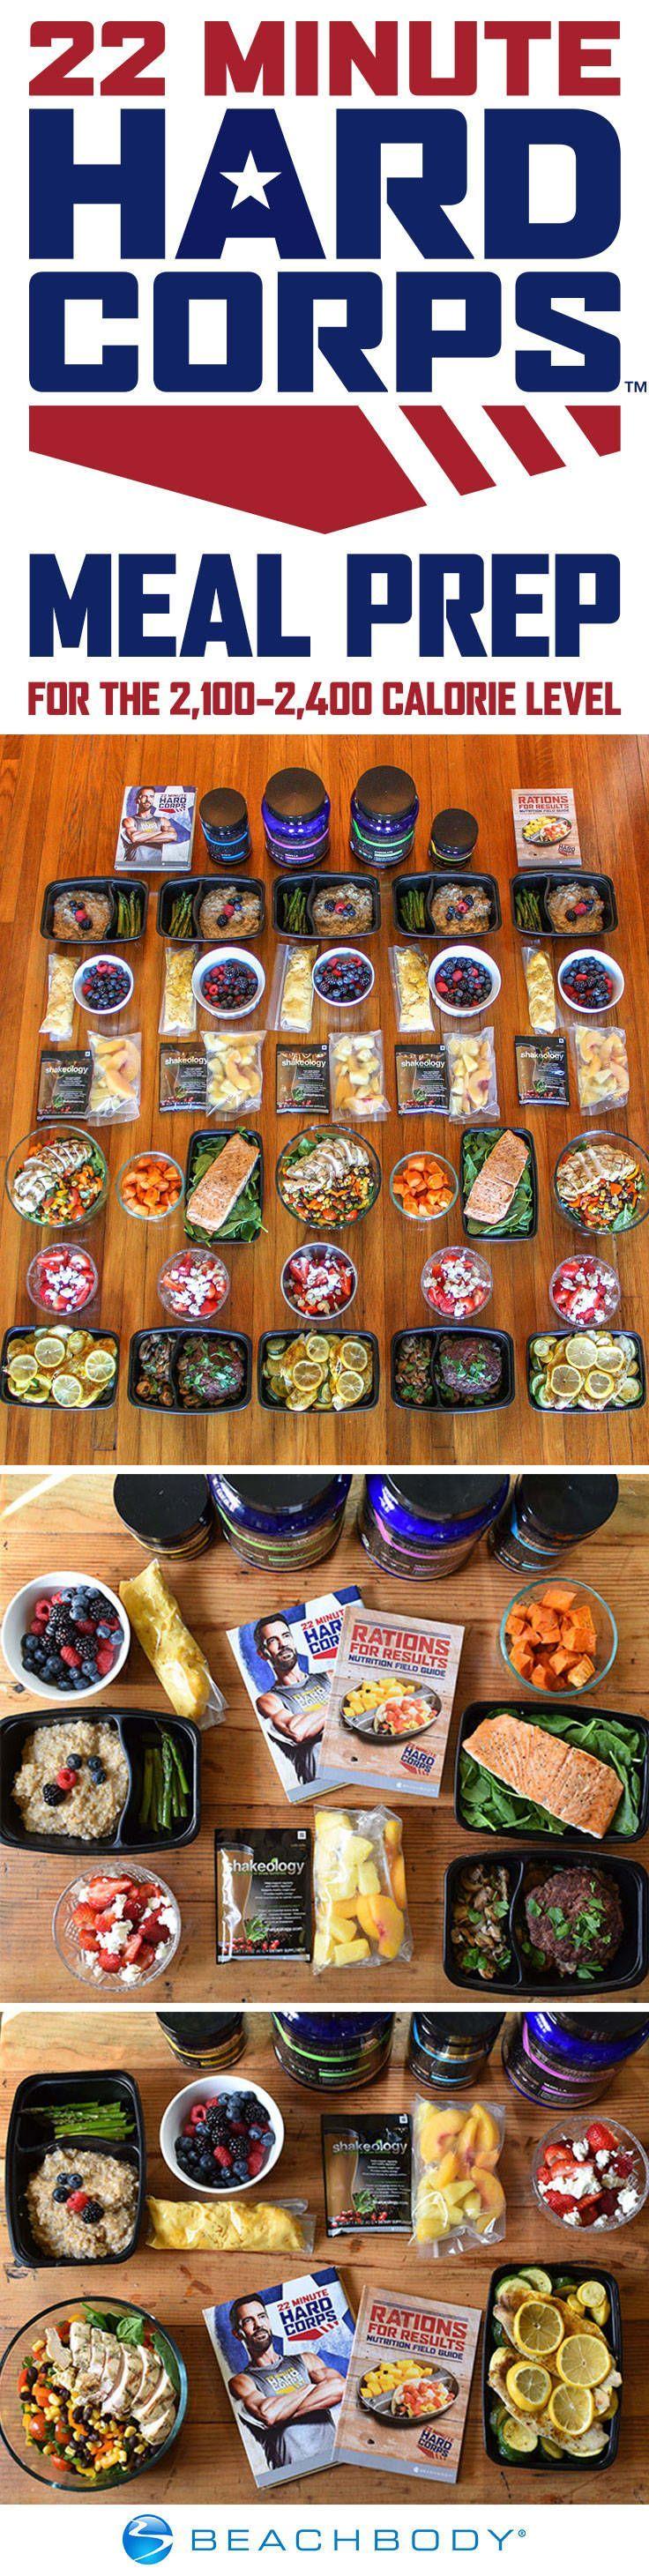 22 Minute Hard Corps Meal Prep for the 2,100–2,400 Calorie Level   BeachbodyBlog.com